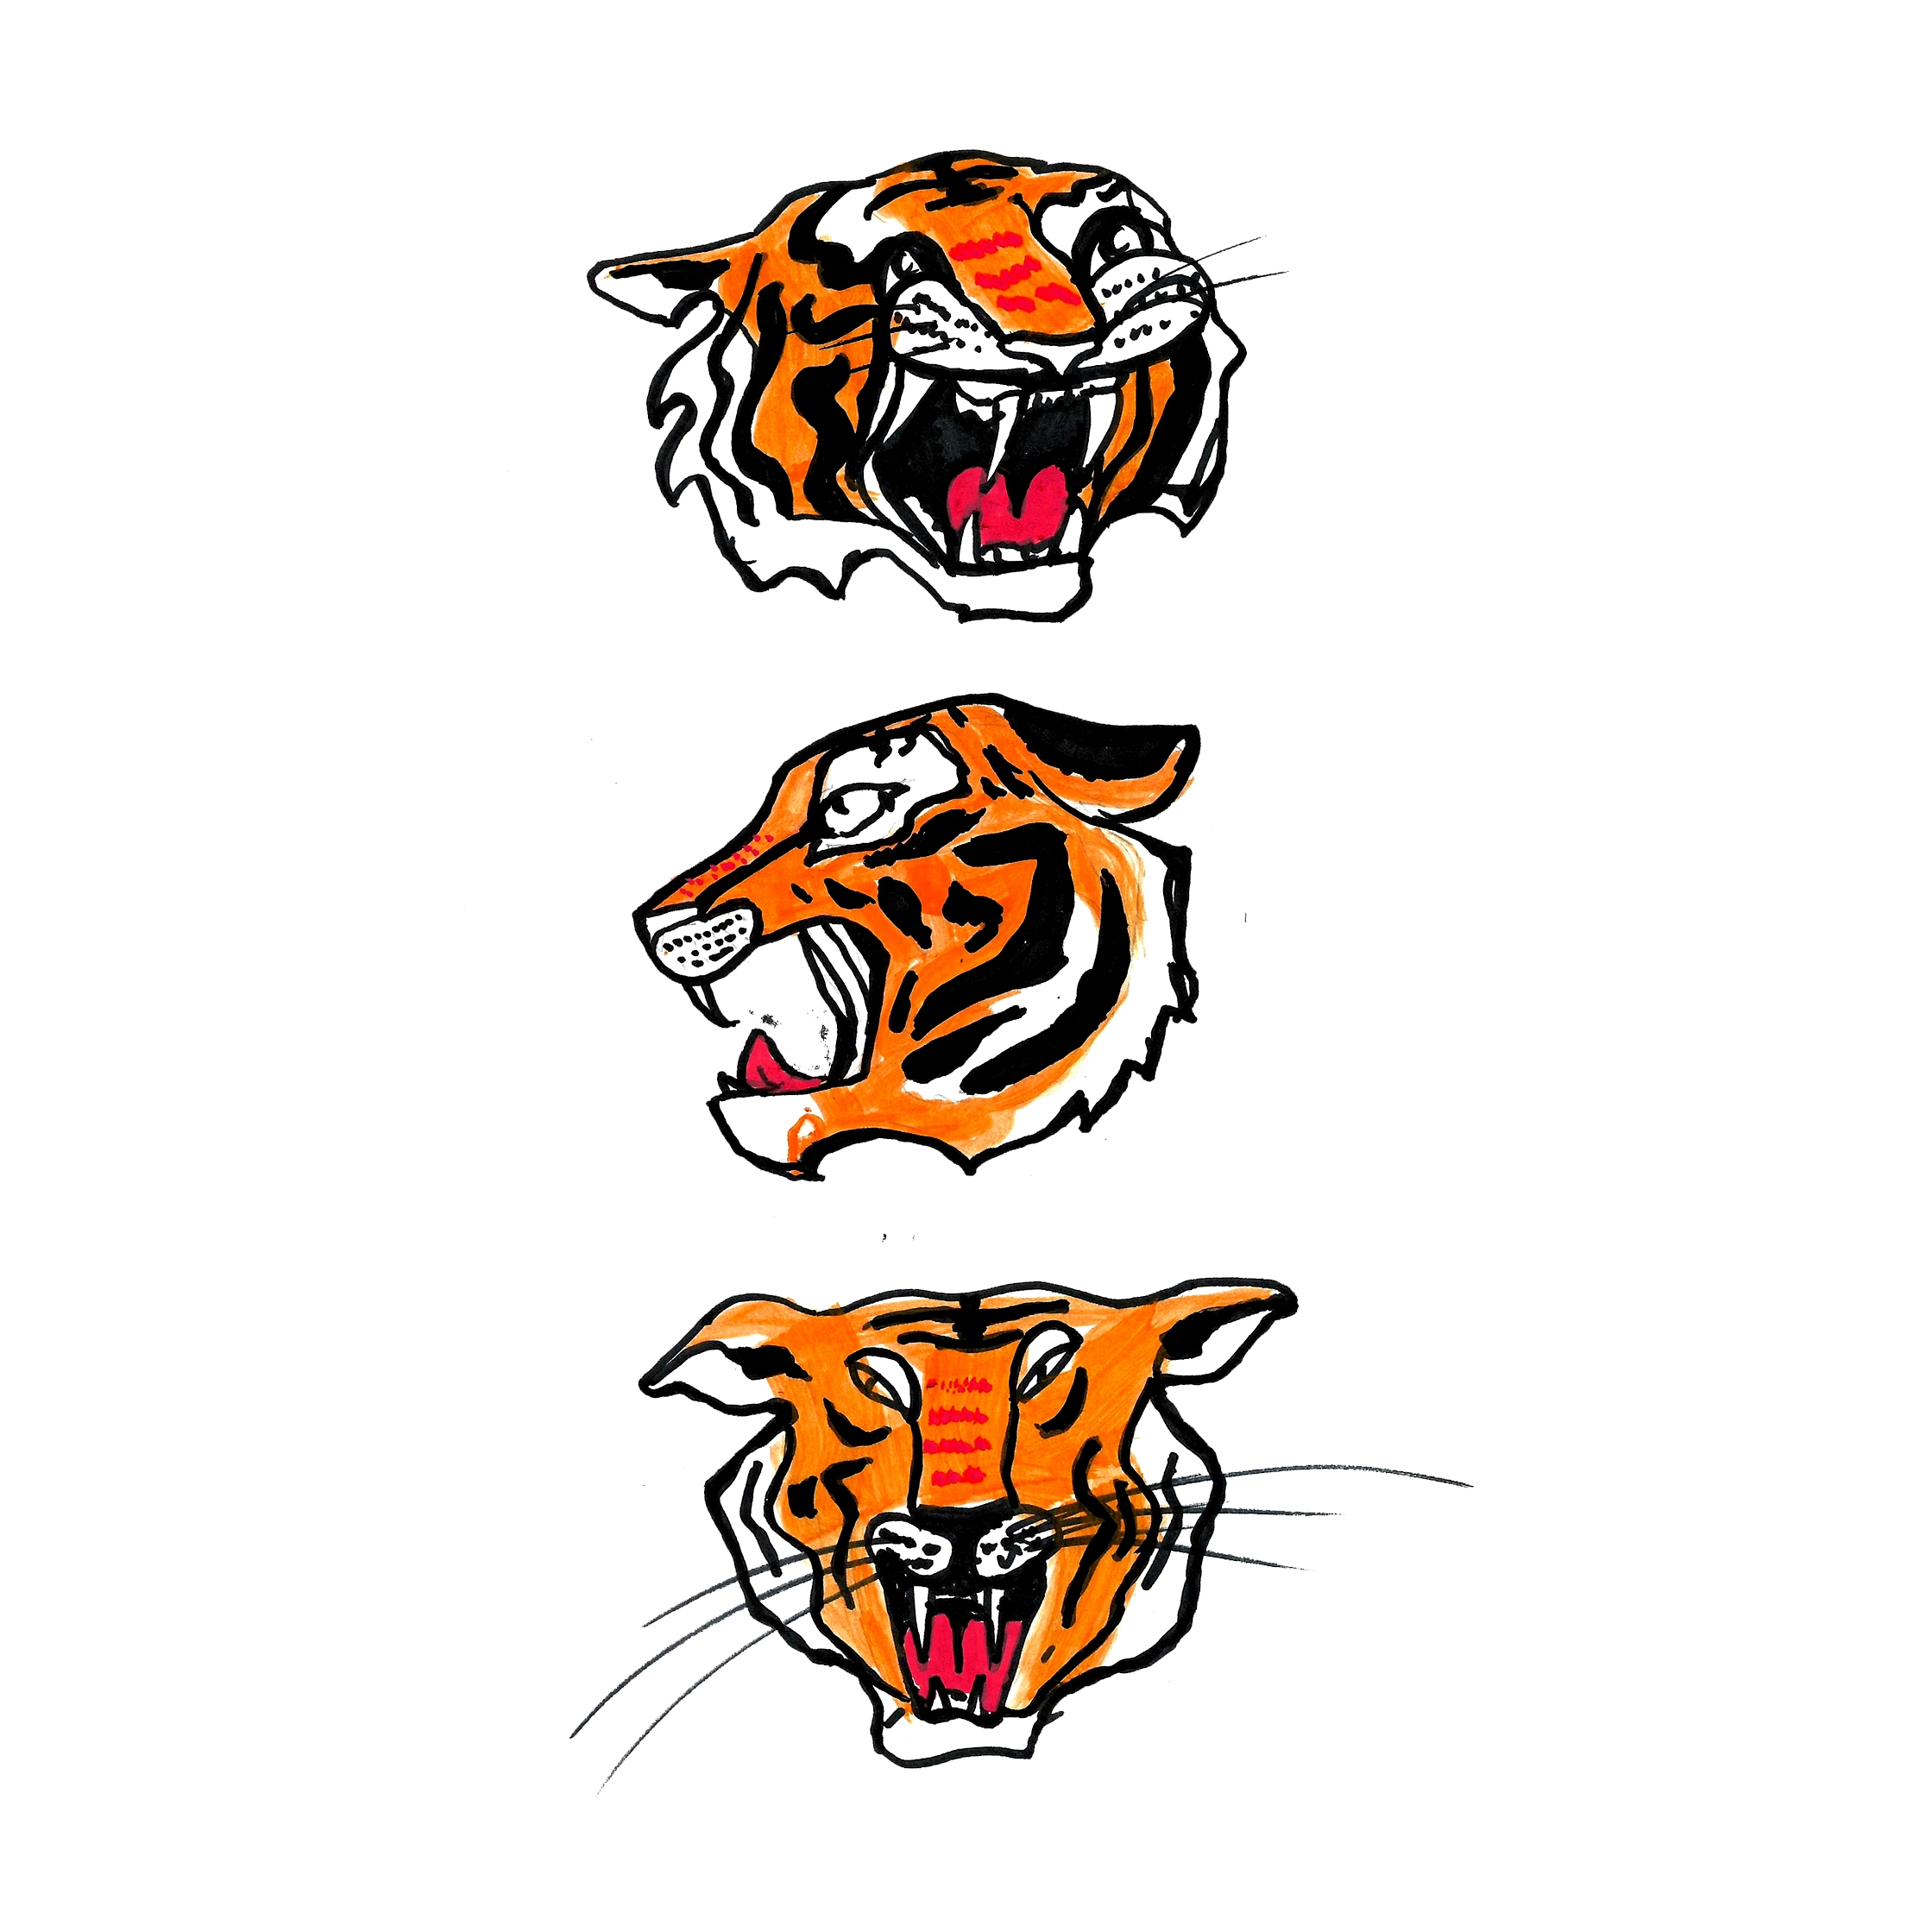 wise tigers - progress follow - mbrasnovic   ello